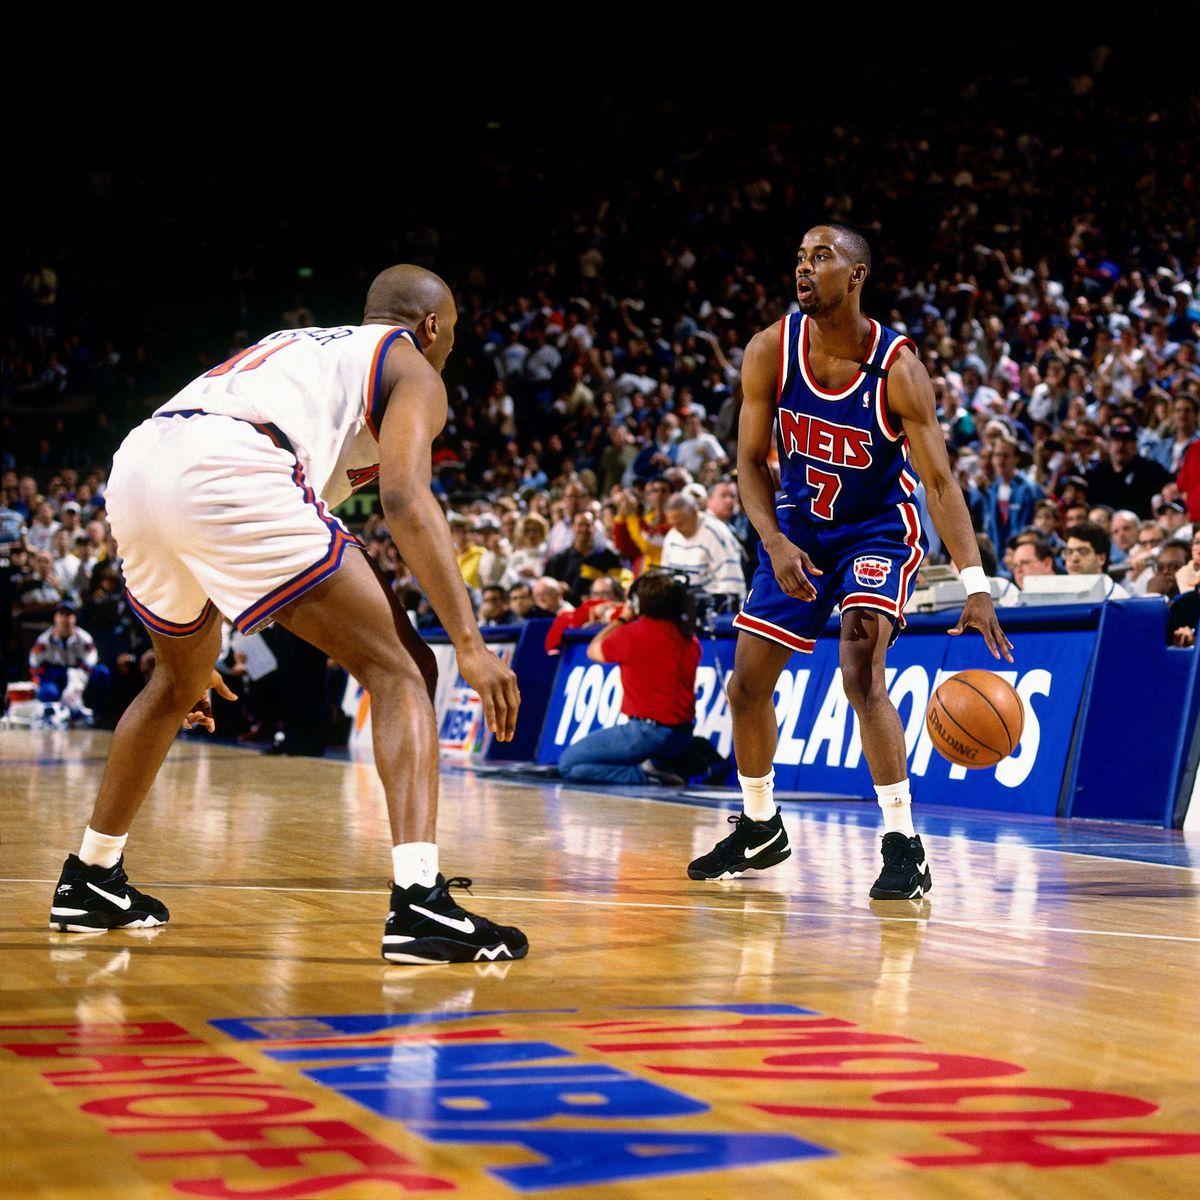 New Jersey Nets vs. New York Knicks, Game 2